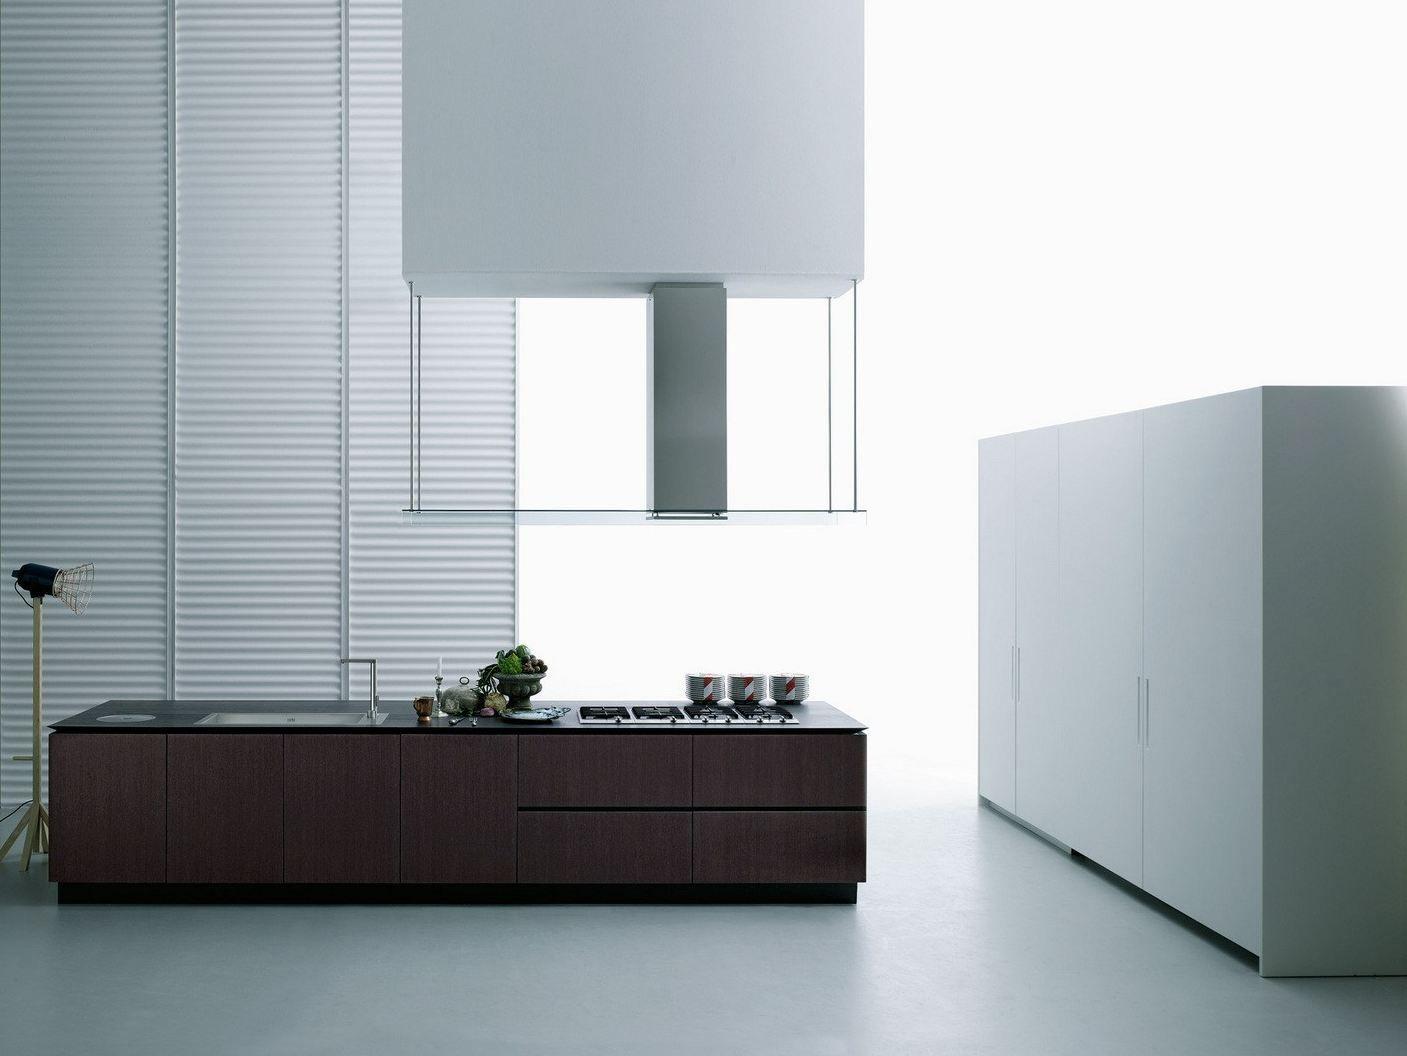 cuisine en corian avec lot k14 by boffi design norbert. Black Bedroom Furniture Sets. Home Design Ideas